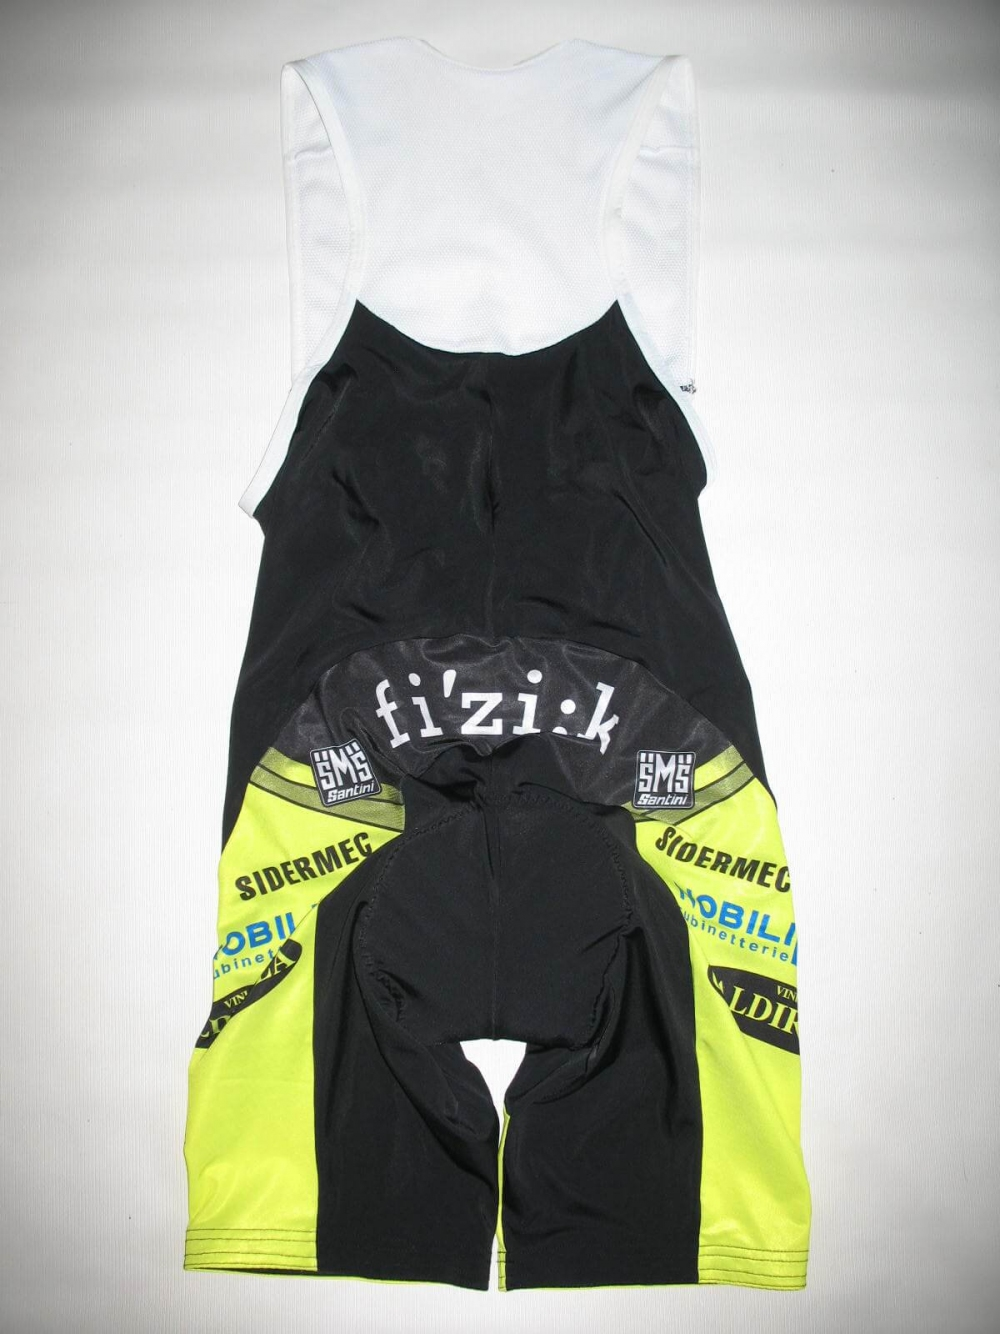 Велошорты SMS SANTINI de rosa/fizik bib shorts (размер 3XL(реально XXL/XL)) - 1